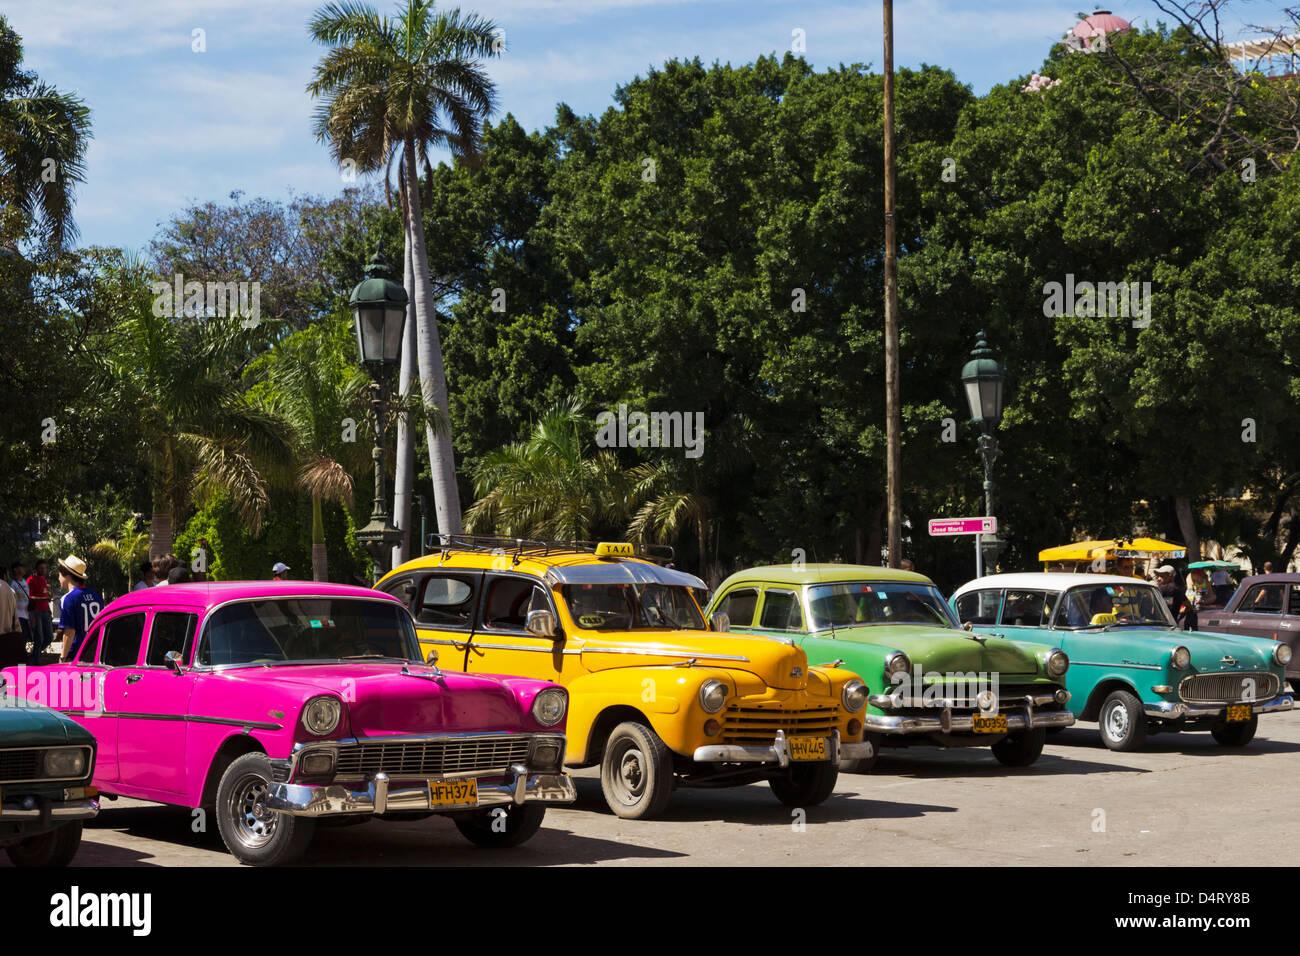 Alte amerikanische Autos in Parque Central Havanna Kuba Stockbild